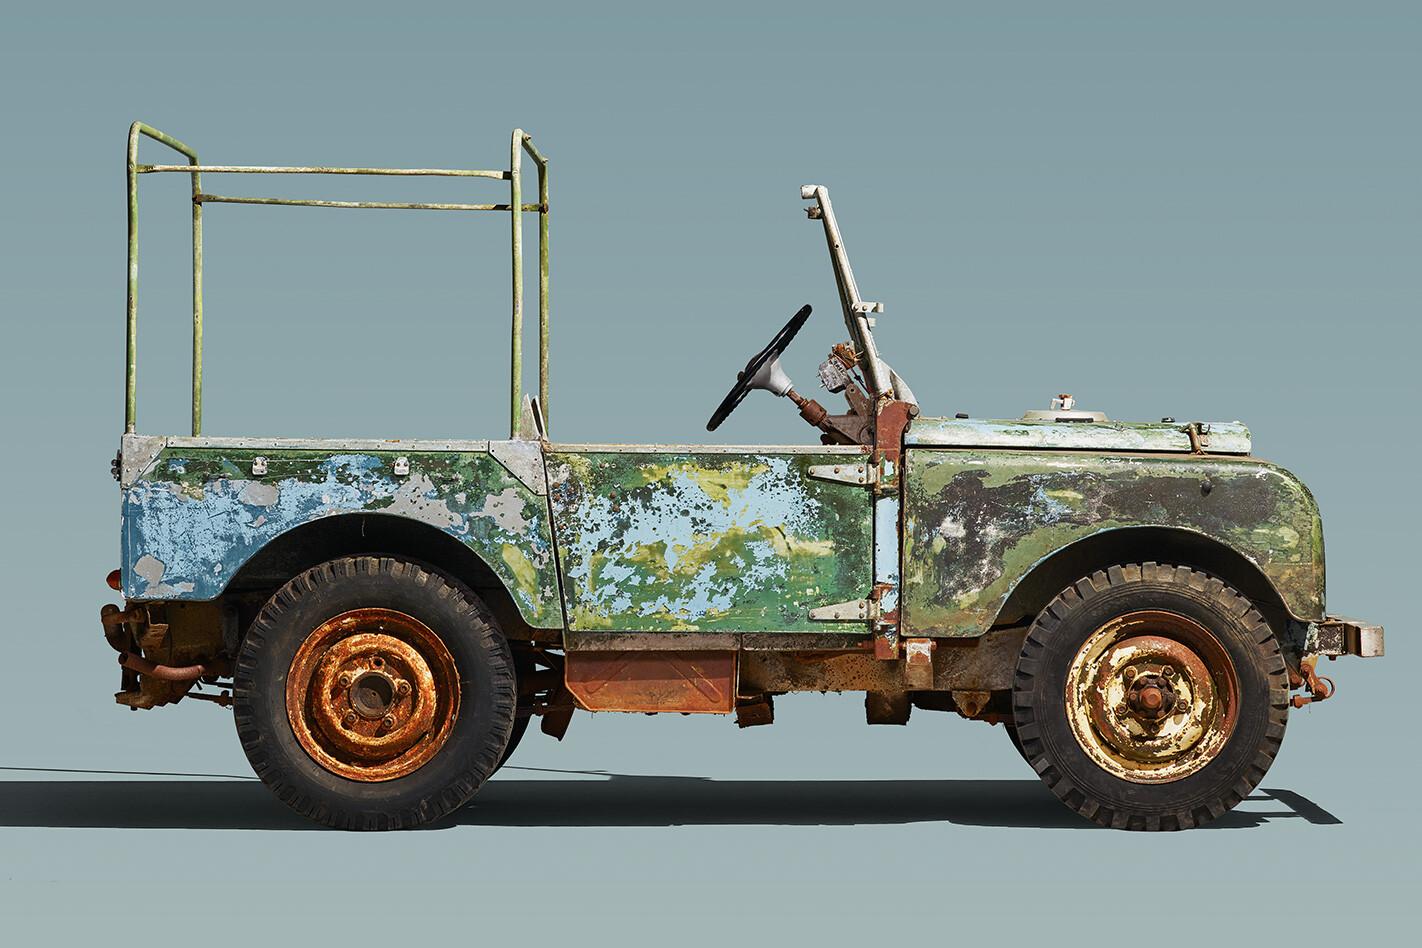 Land Rover Side Jpg